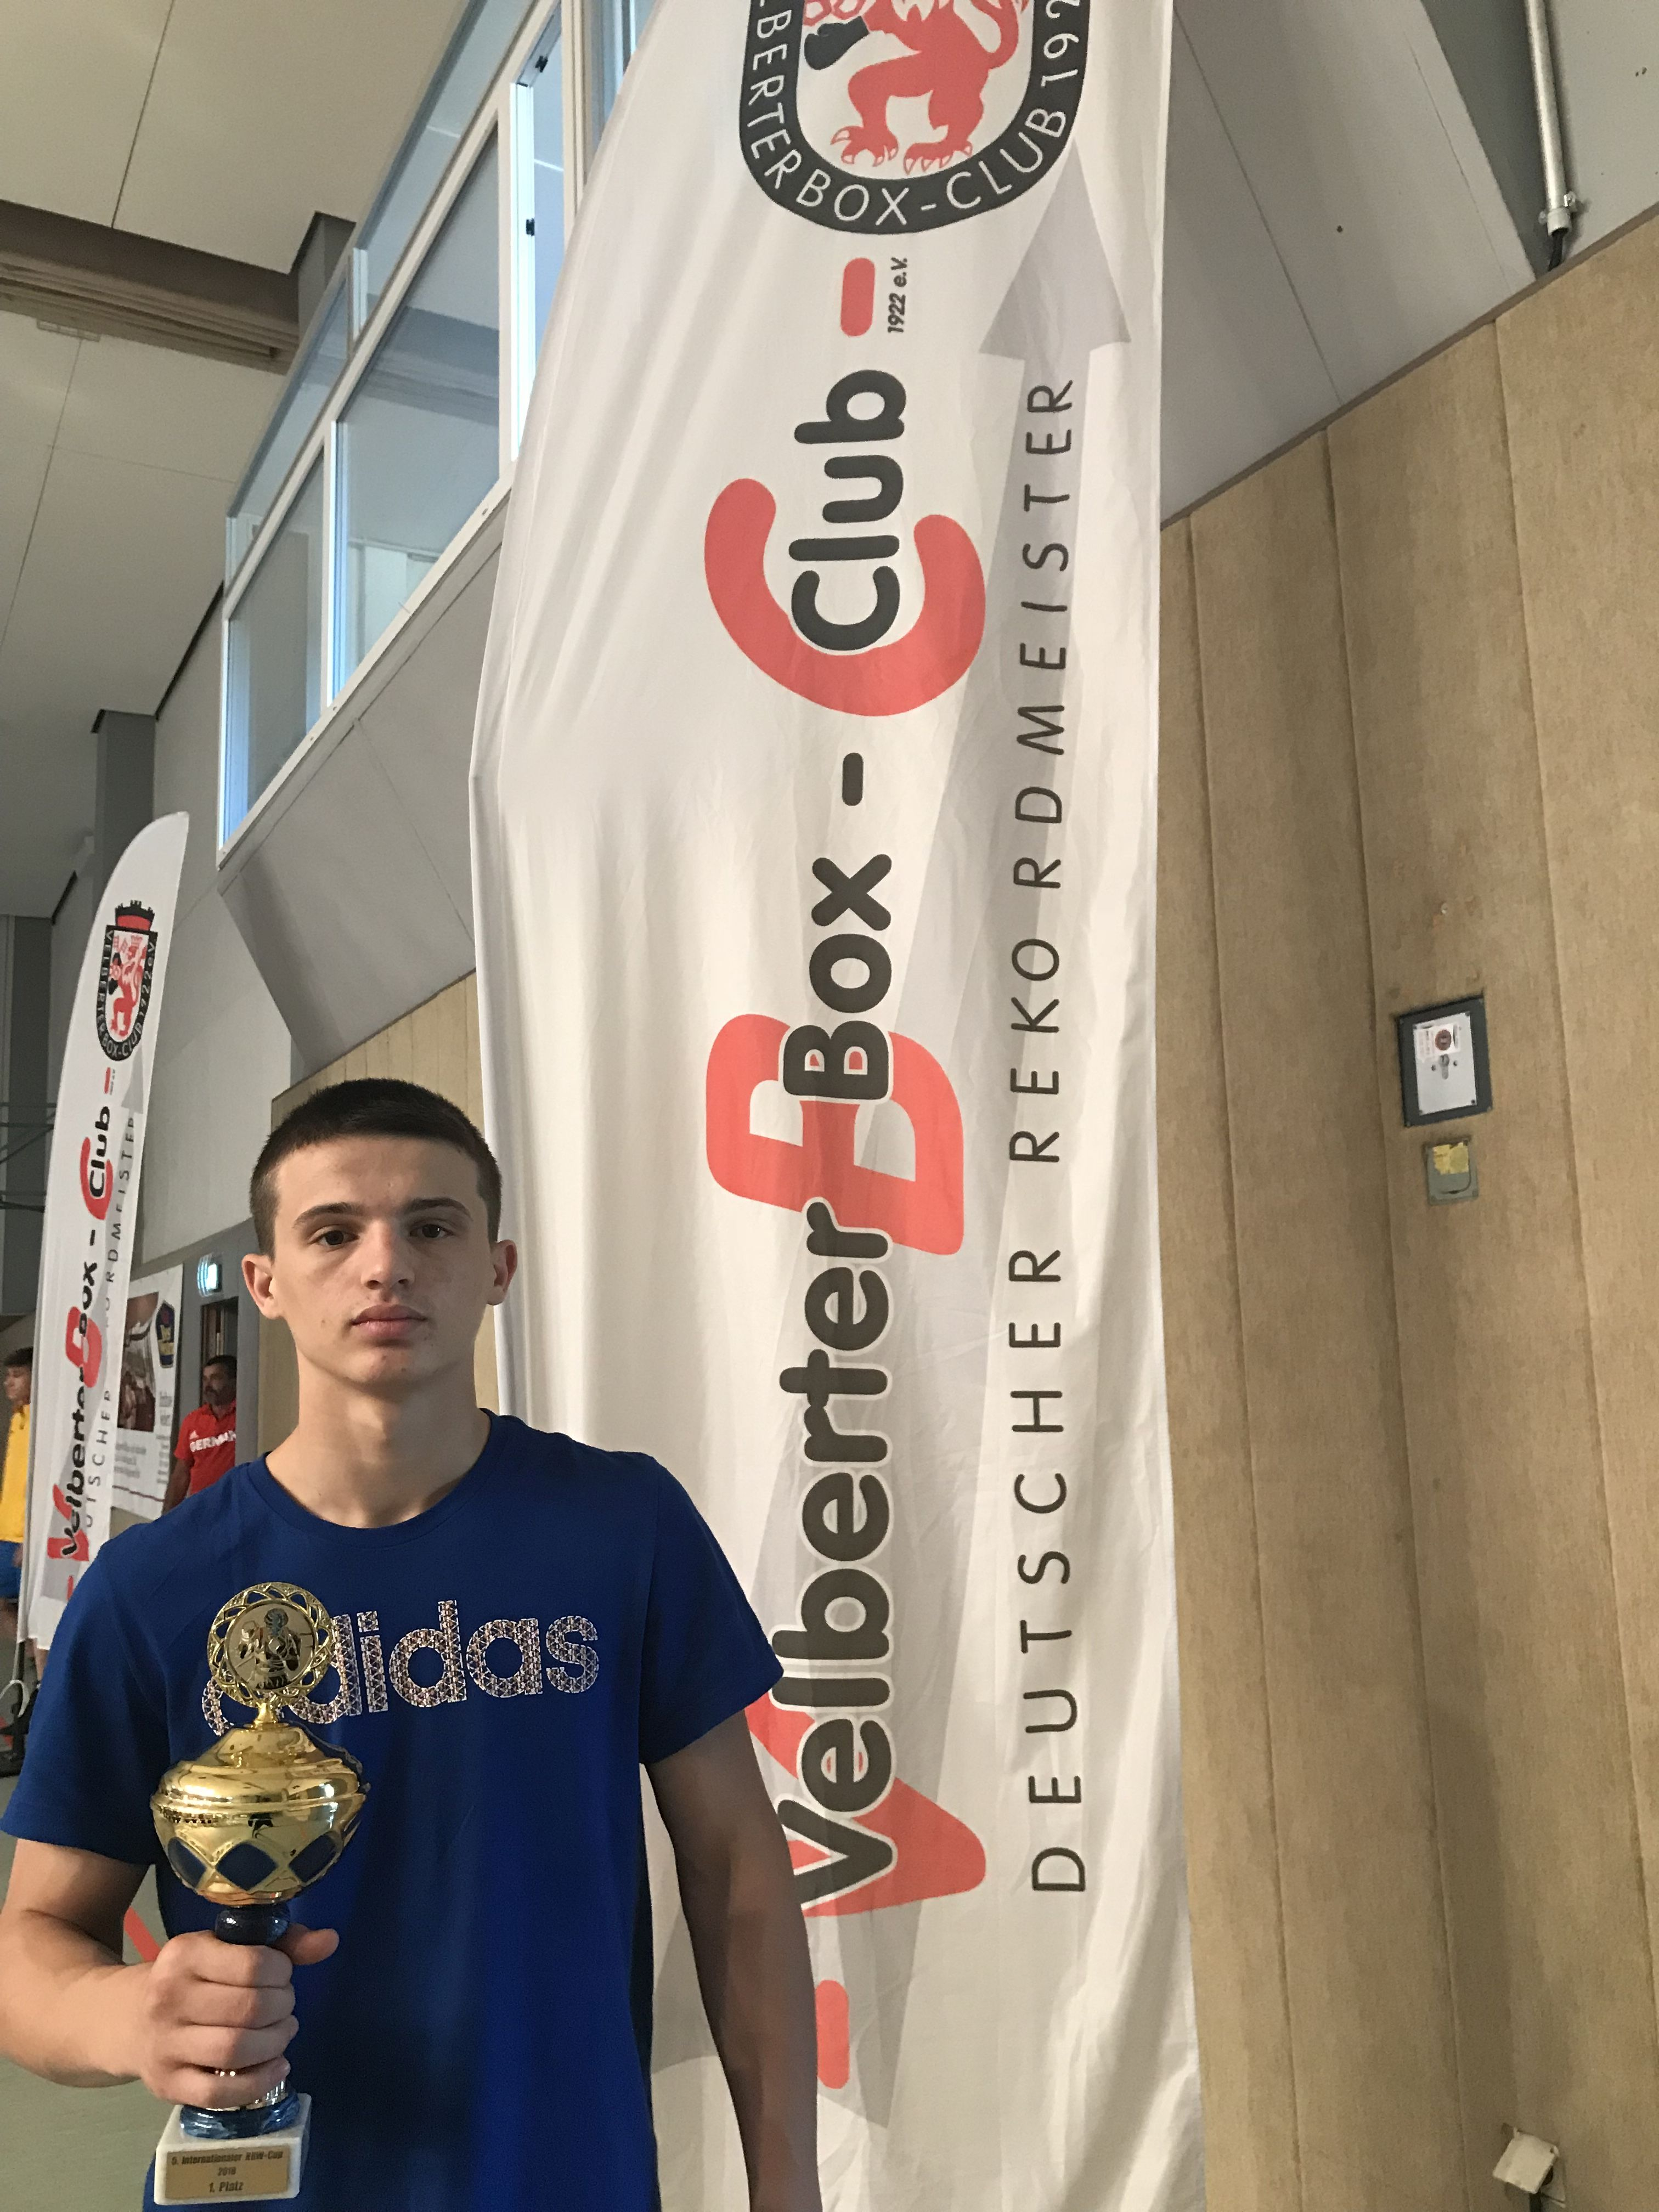 Altin Murati mit NRW-Cup 2018